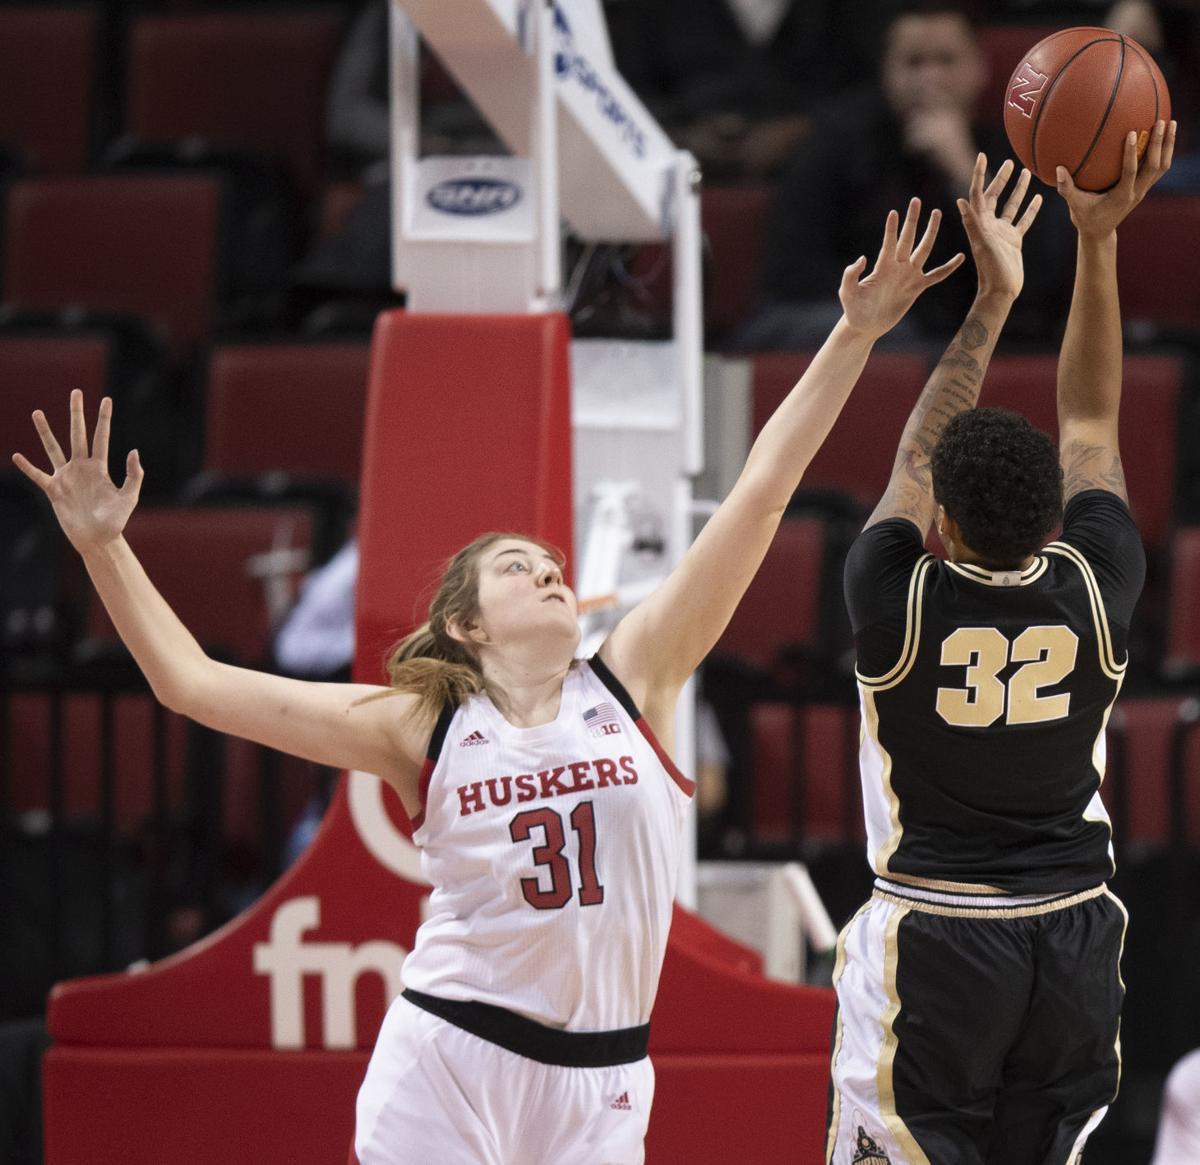 Kate Cain Quickly Became The Best Shot Blocker In Nebraska Women S Basketball History Women S Basketball Journalstar Com